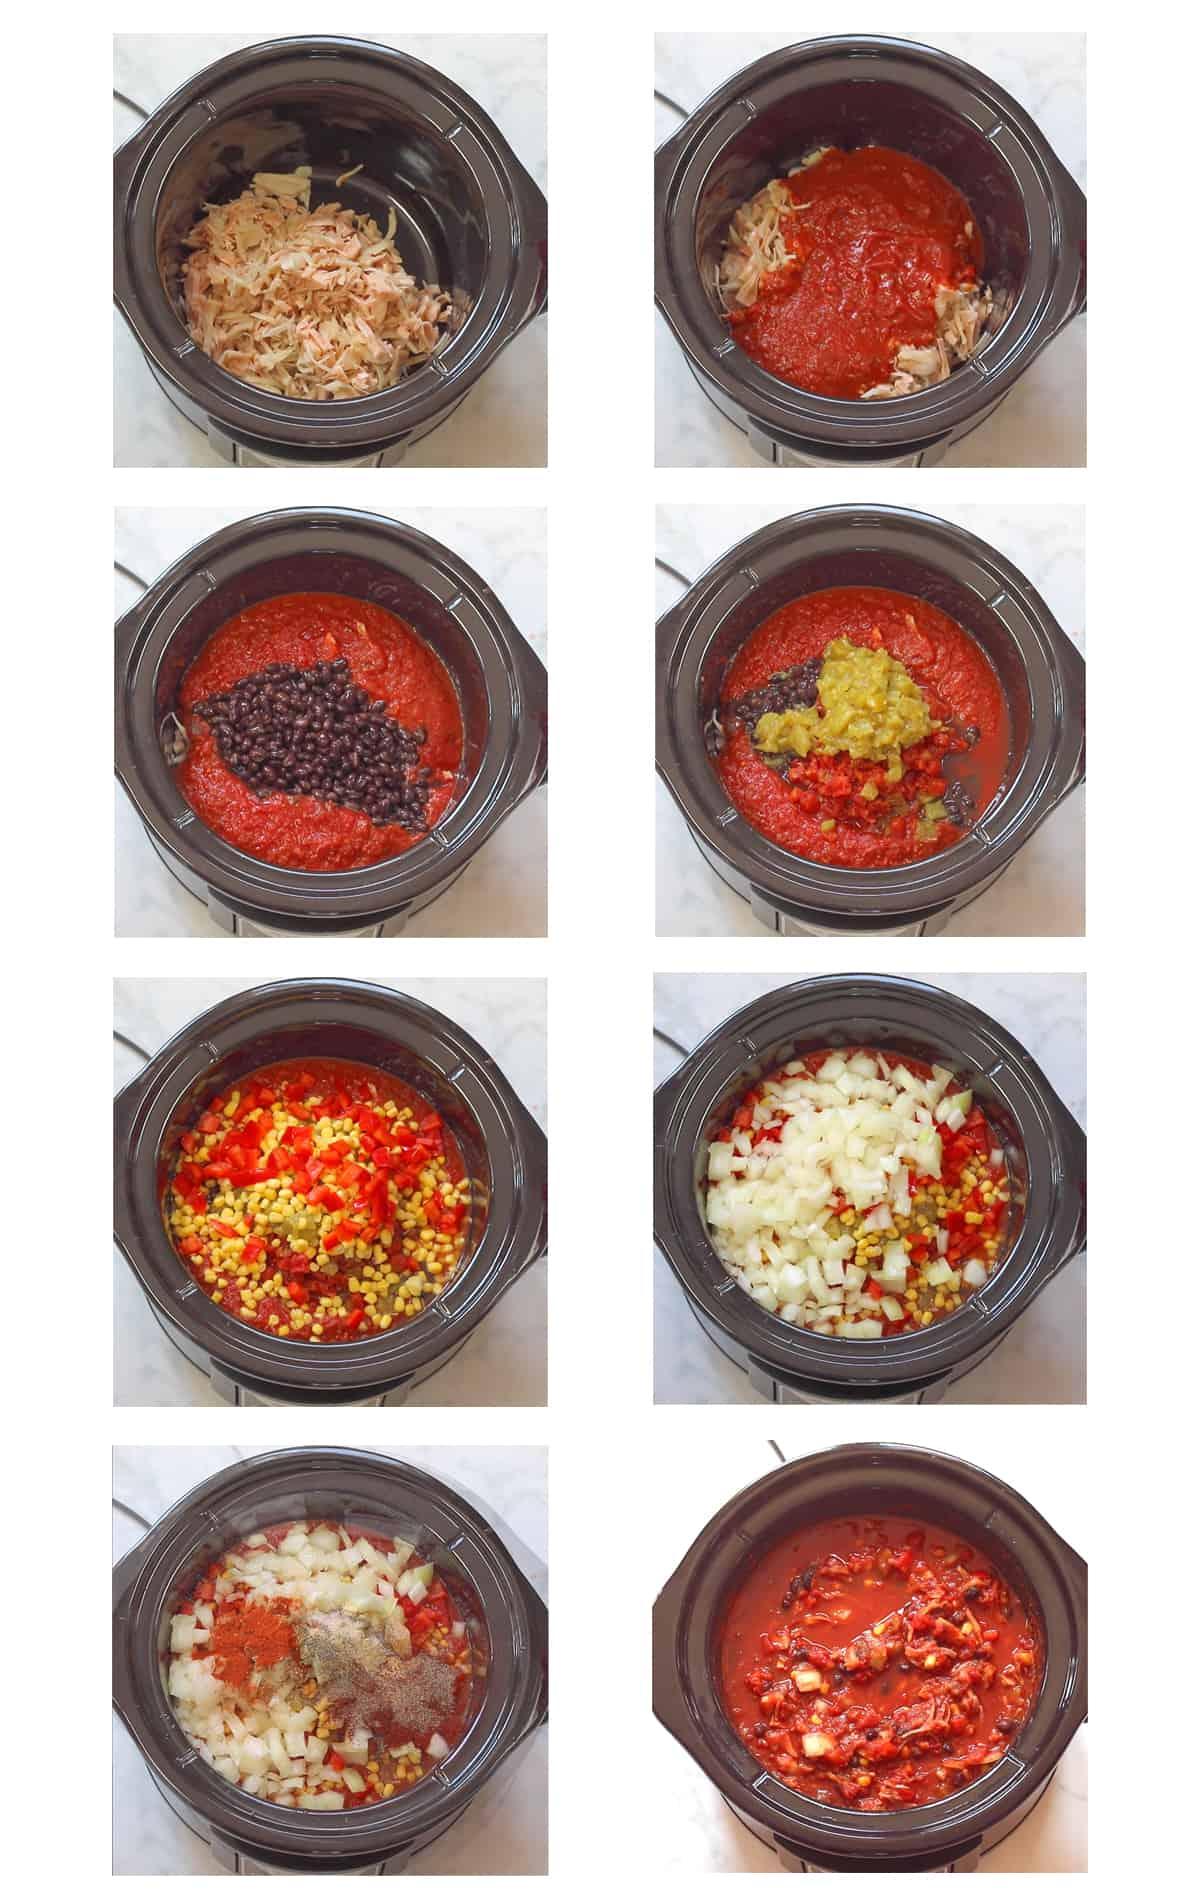 Jackfruit Chili Vegan Jackfruit Crockpot Slowcooker Chili Recipe